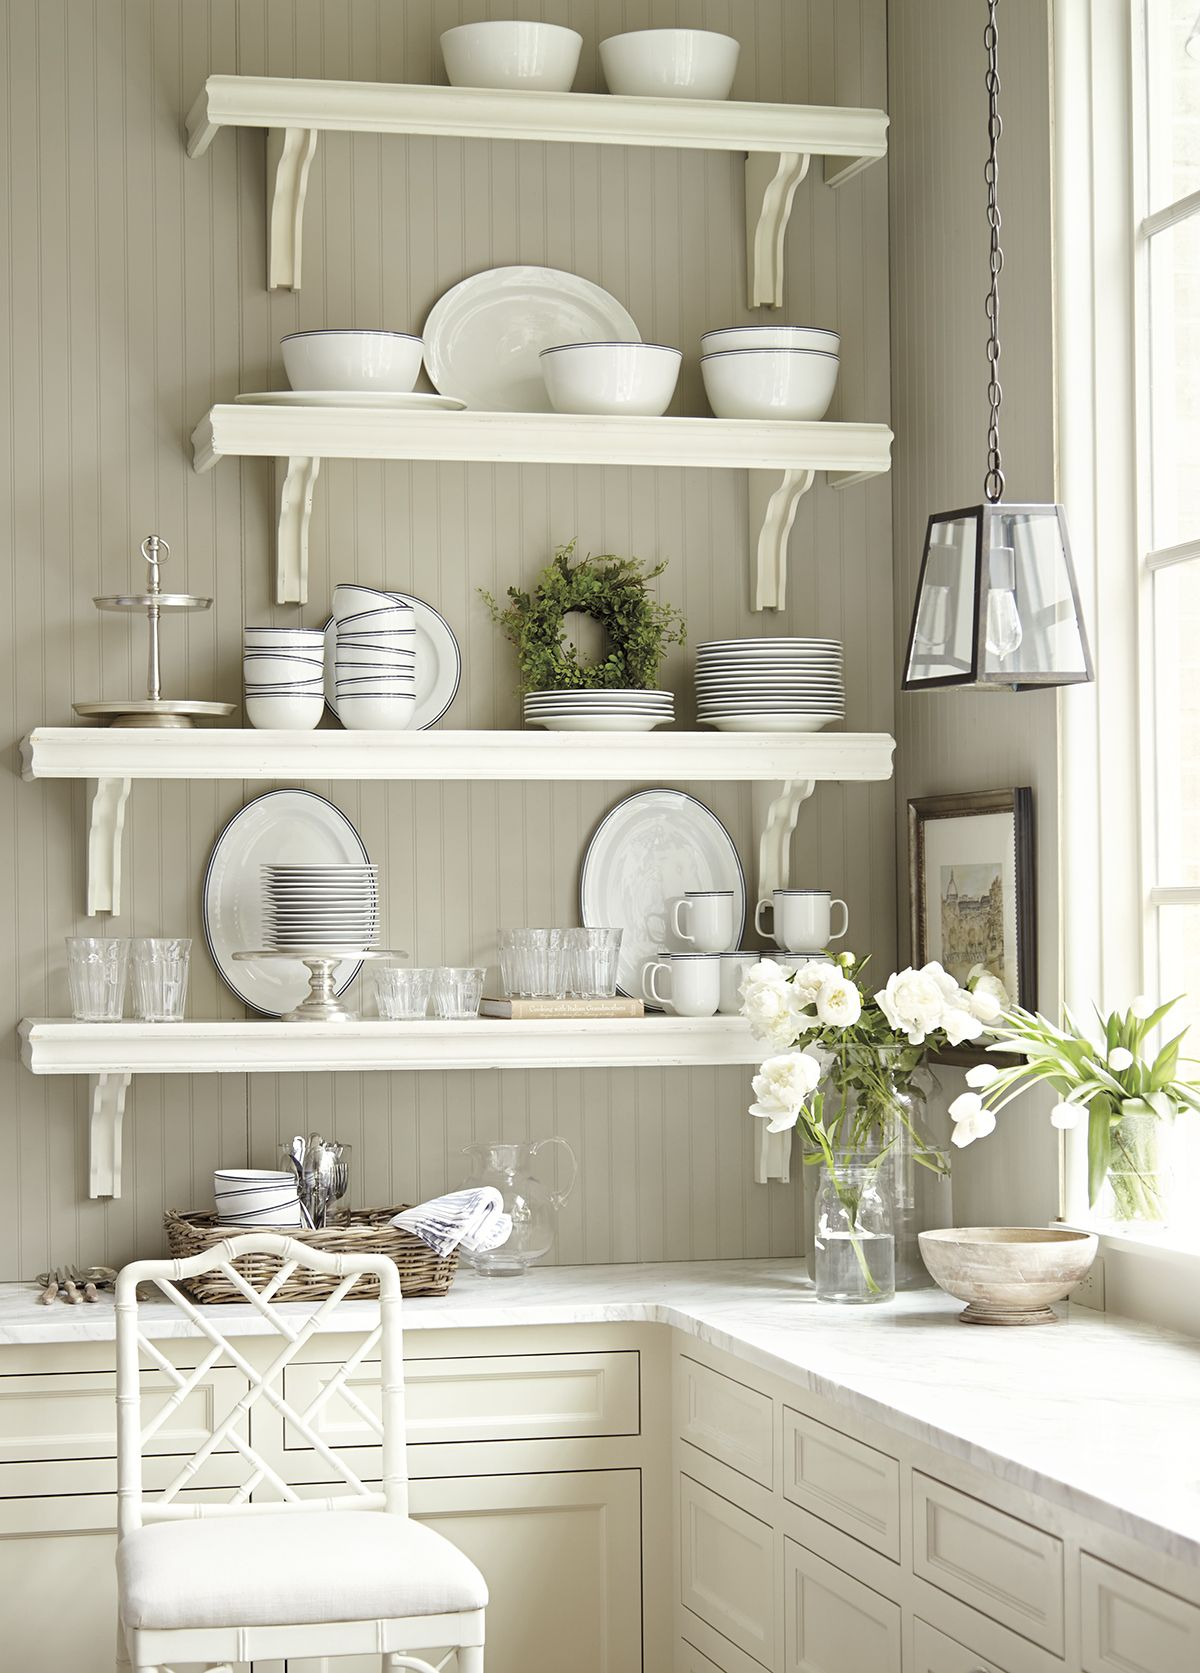 Rustic Kitchen Shelving Ideas  Training4Green  Interior Home Cool Kitchen Shelves Designs Decorating Design